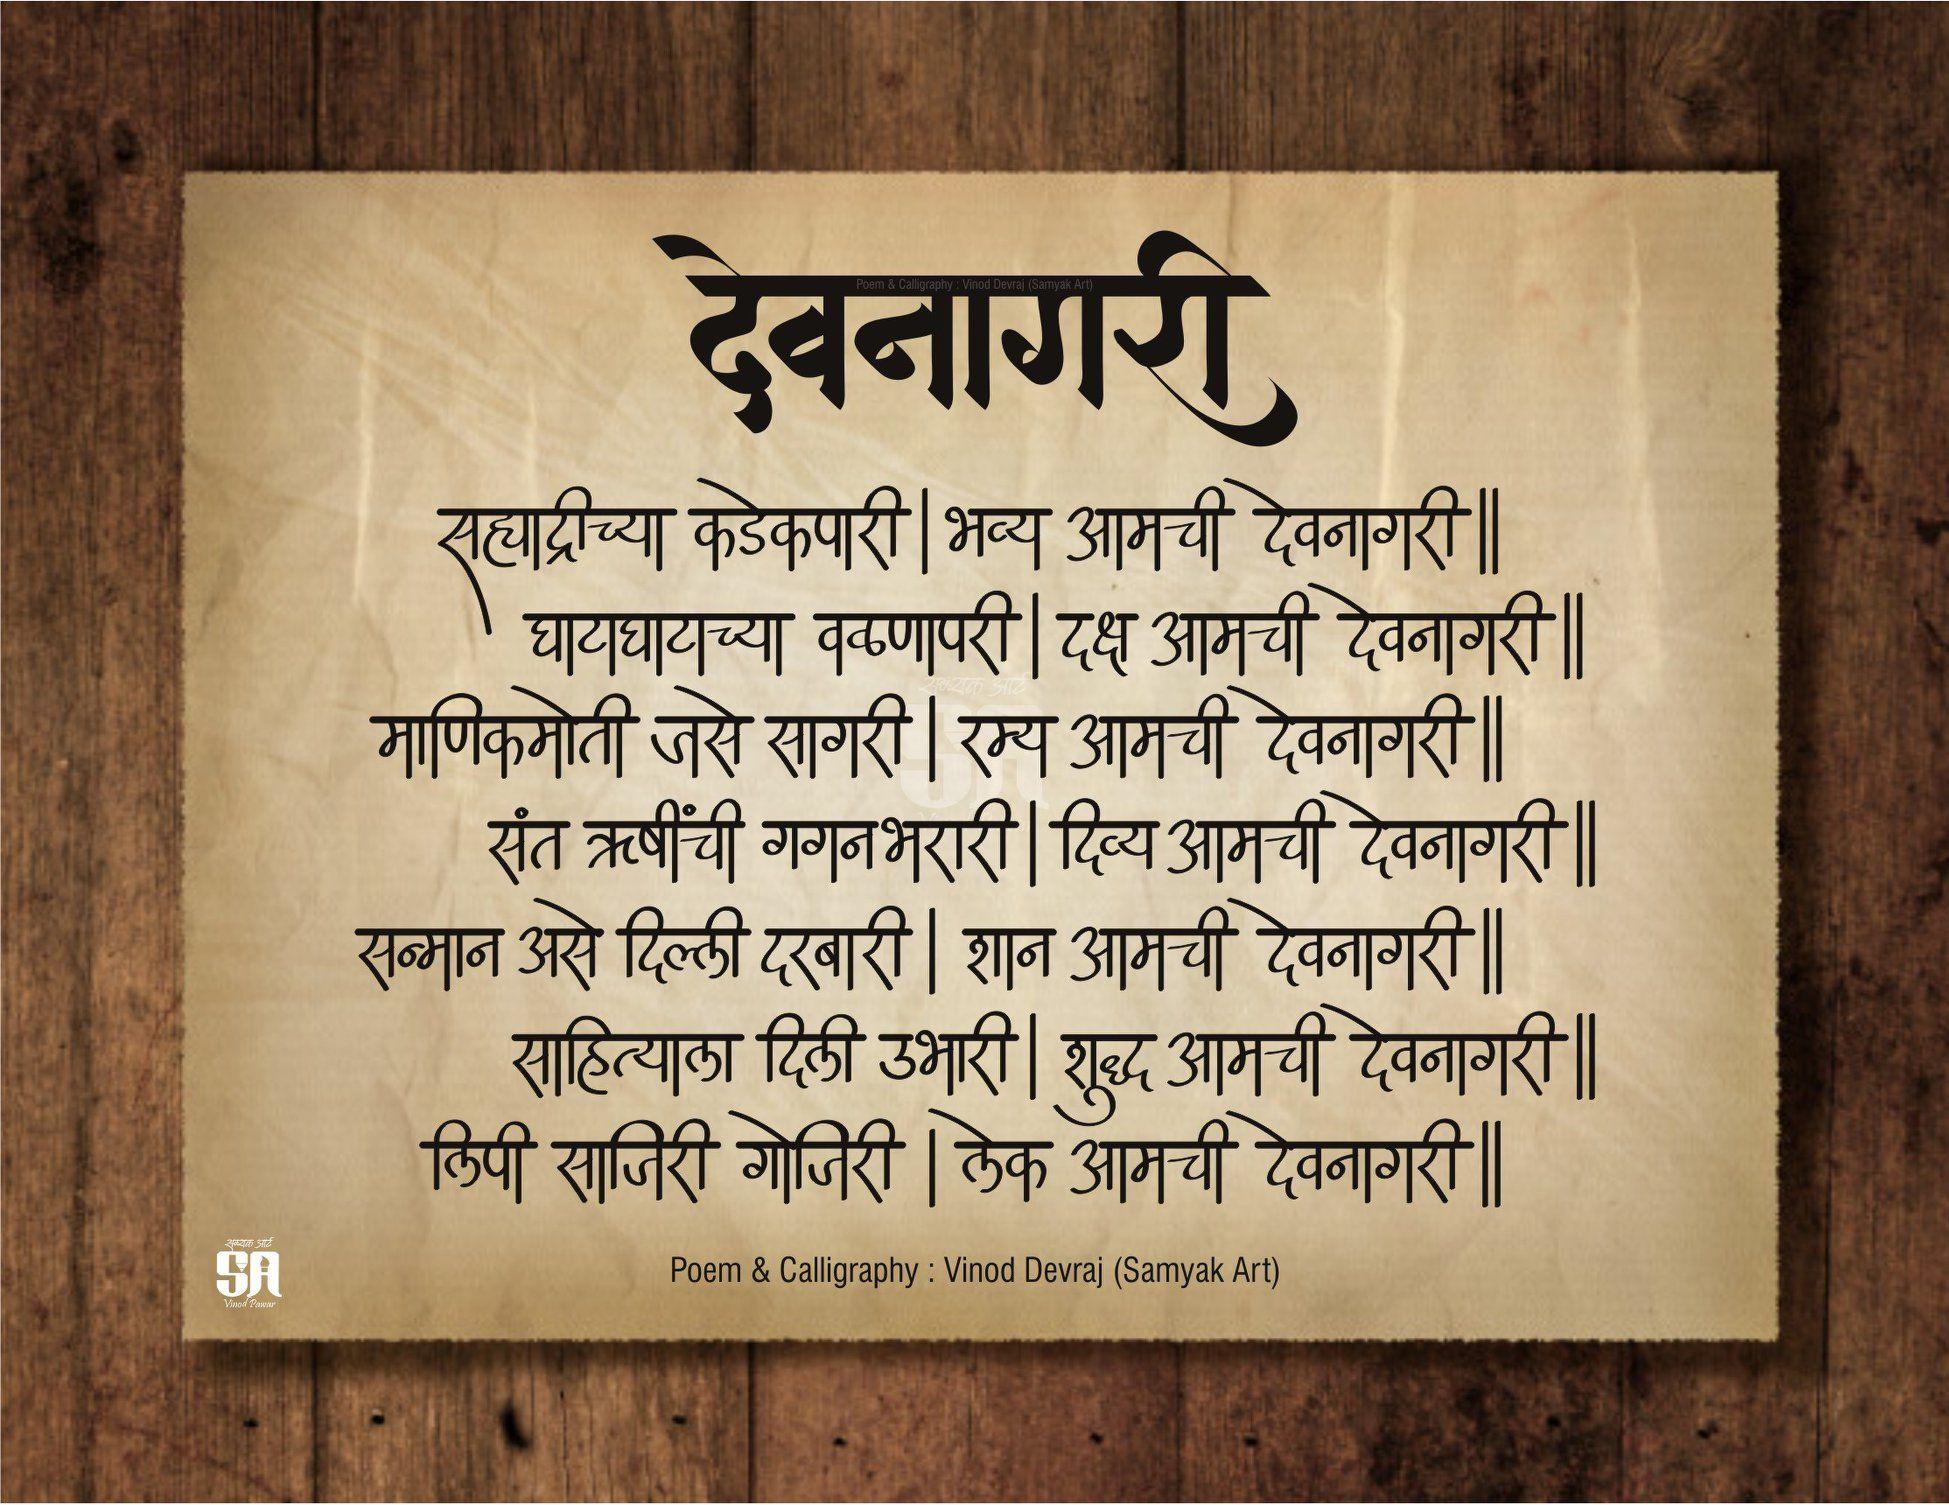 Pin by Viraj on Calligraphy Calligraphy words, Marathi